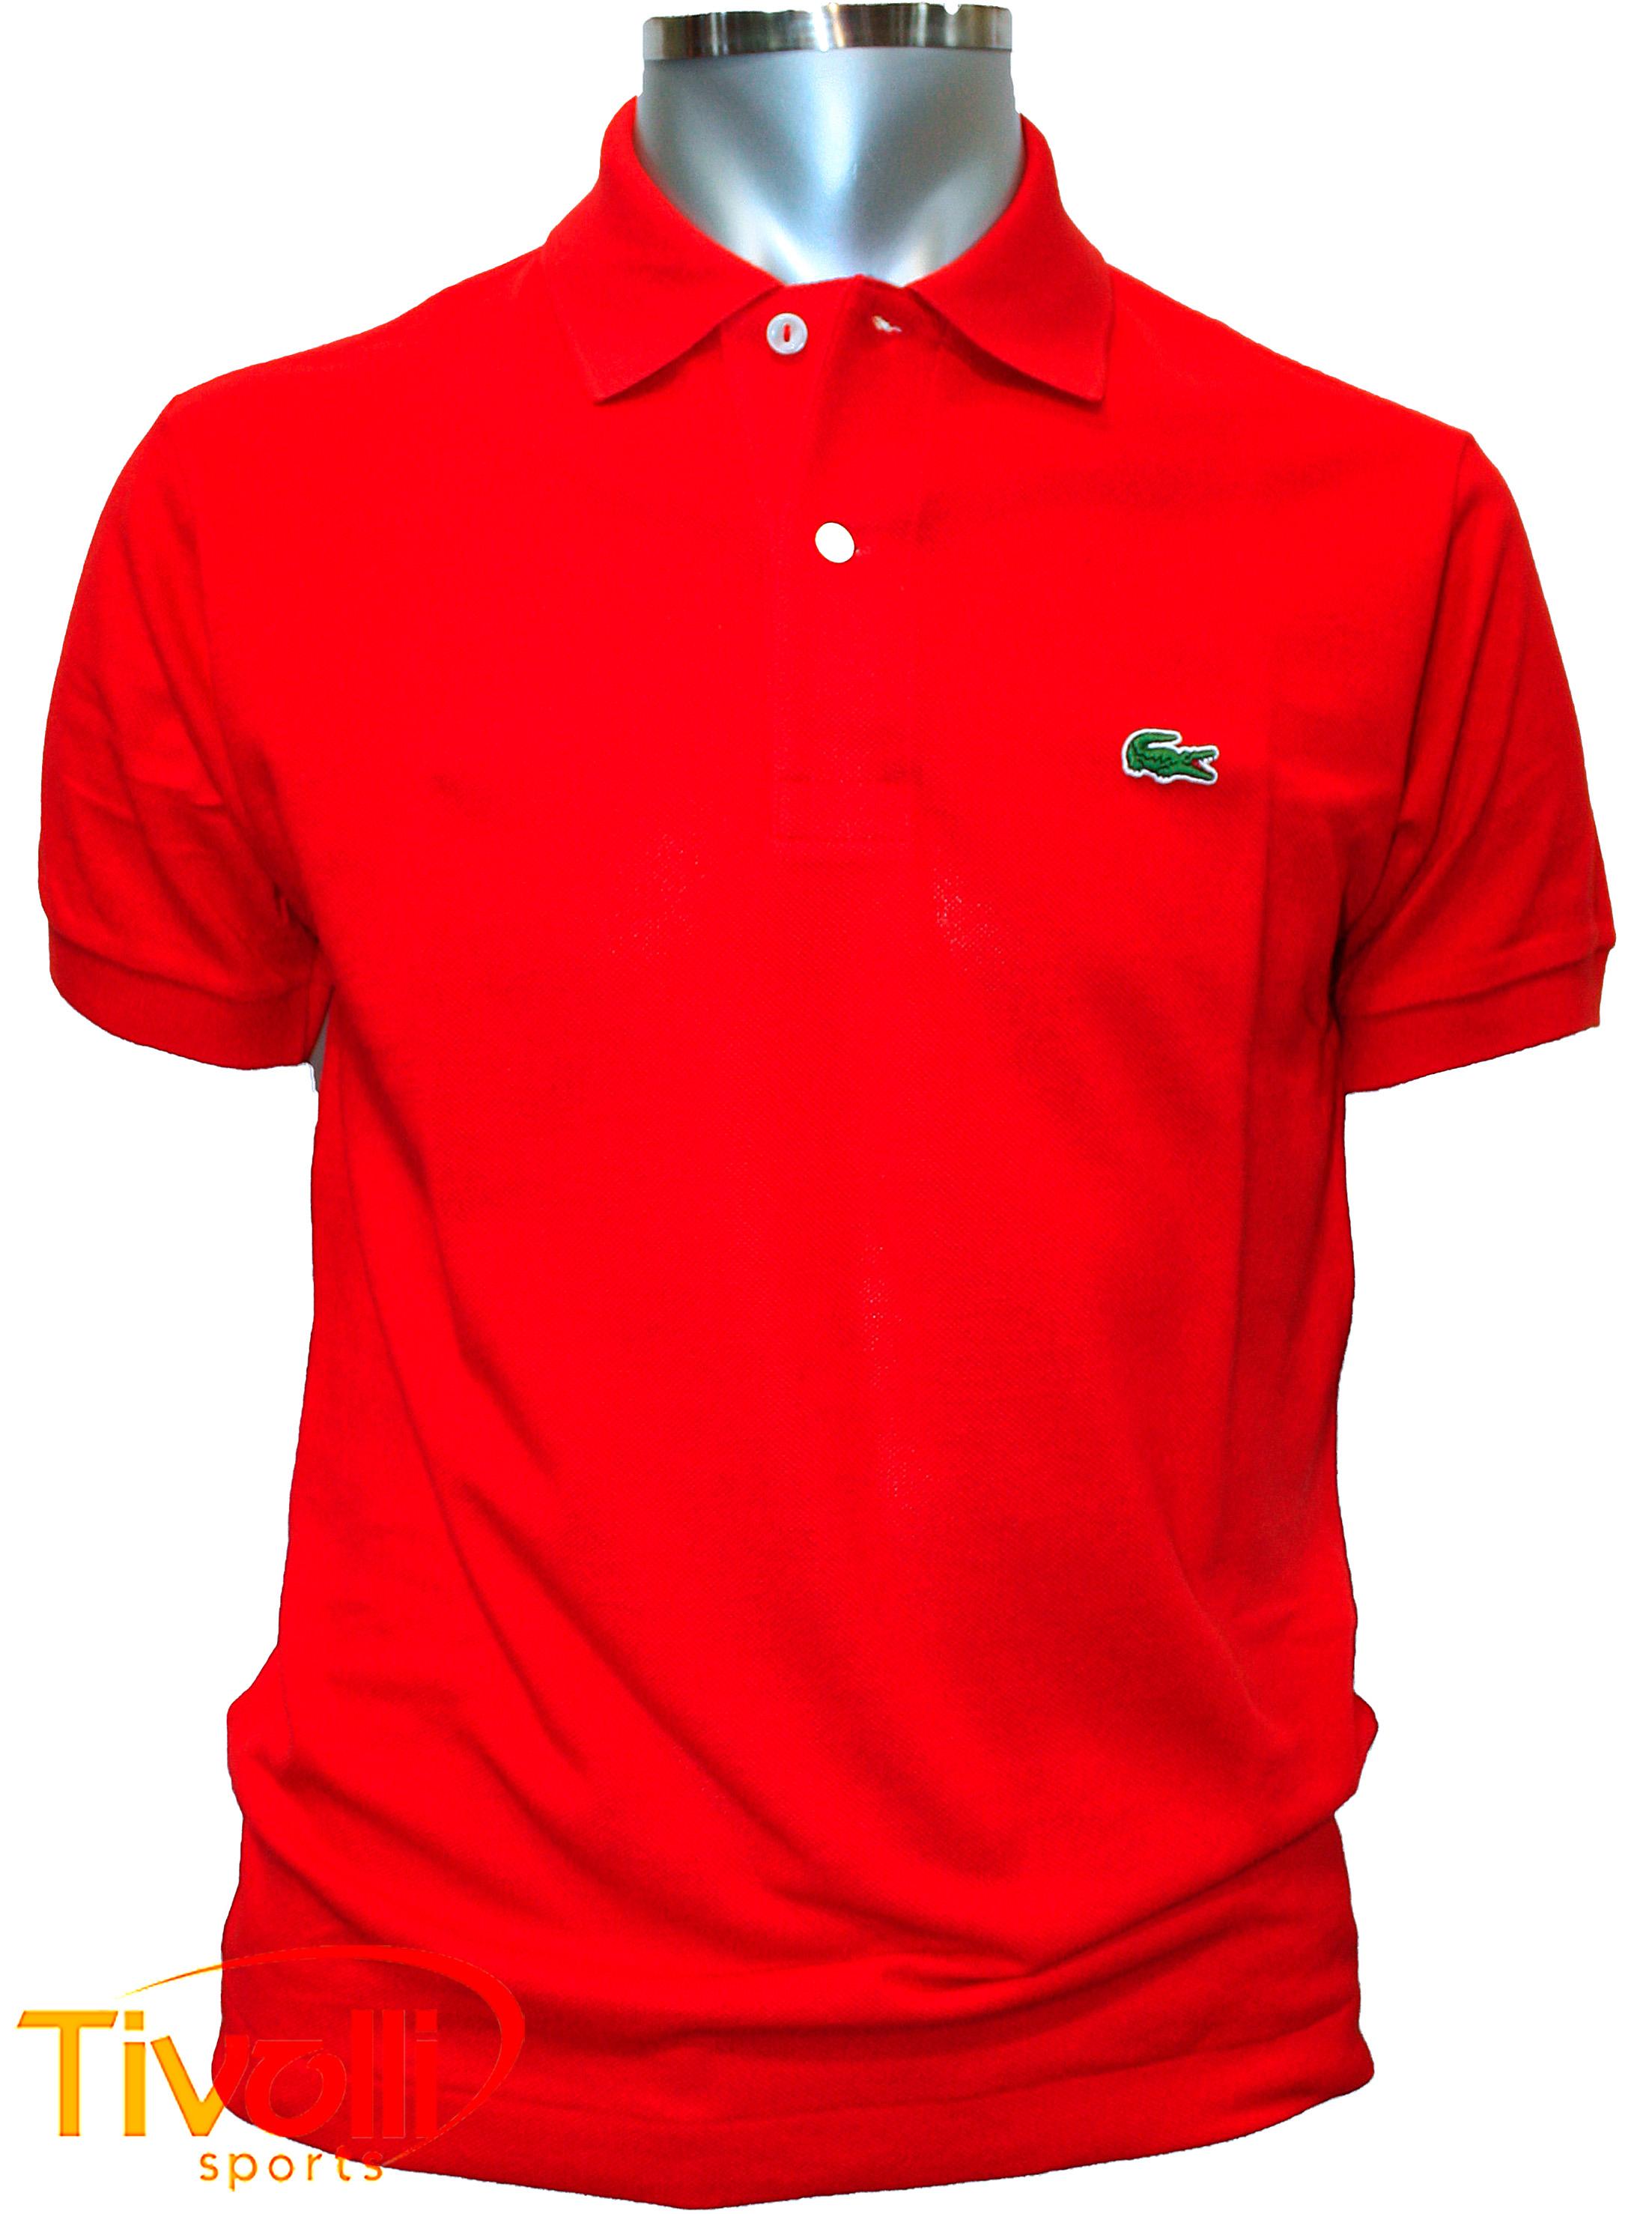 Camisa Polo Lacoste   Básica vermelha   ca4517896b